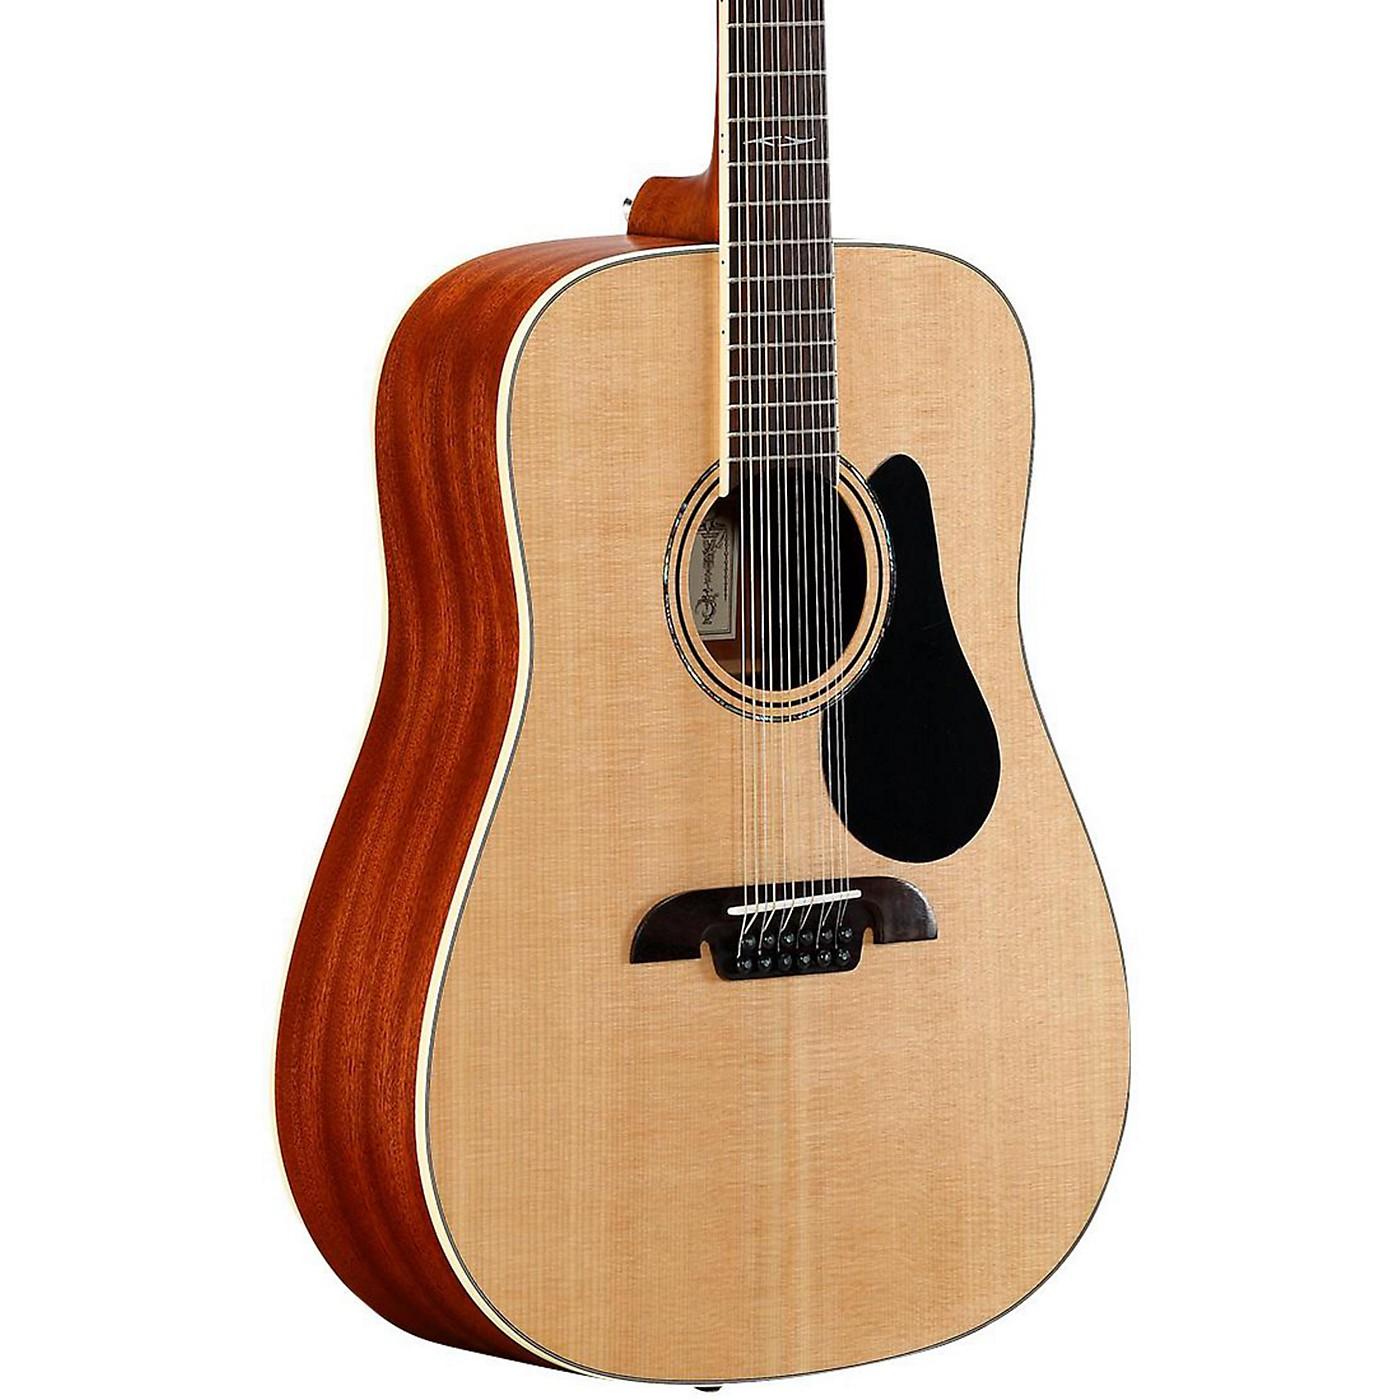 Alvarez Artist Series AD60-12 Dreadnought Twelve String Acoustic Guitar thumbnail